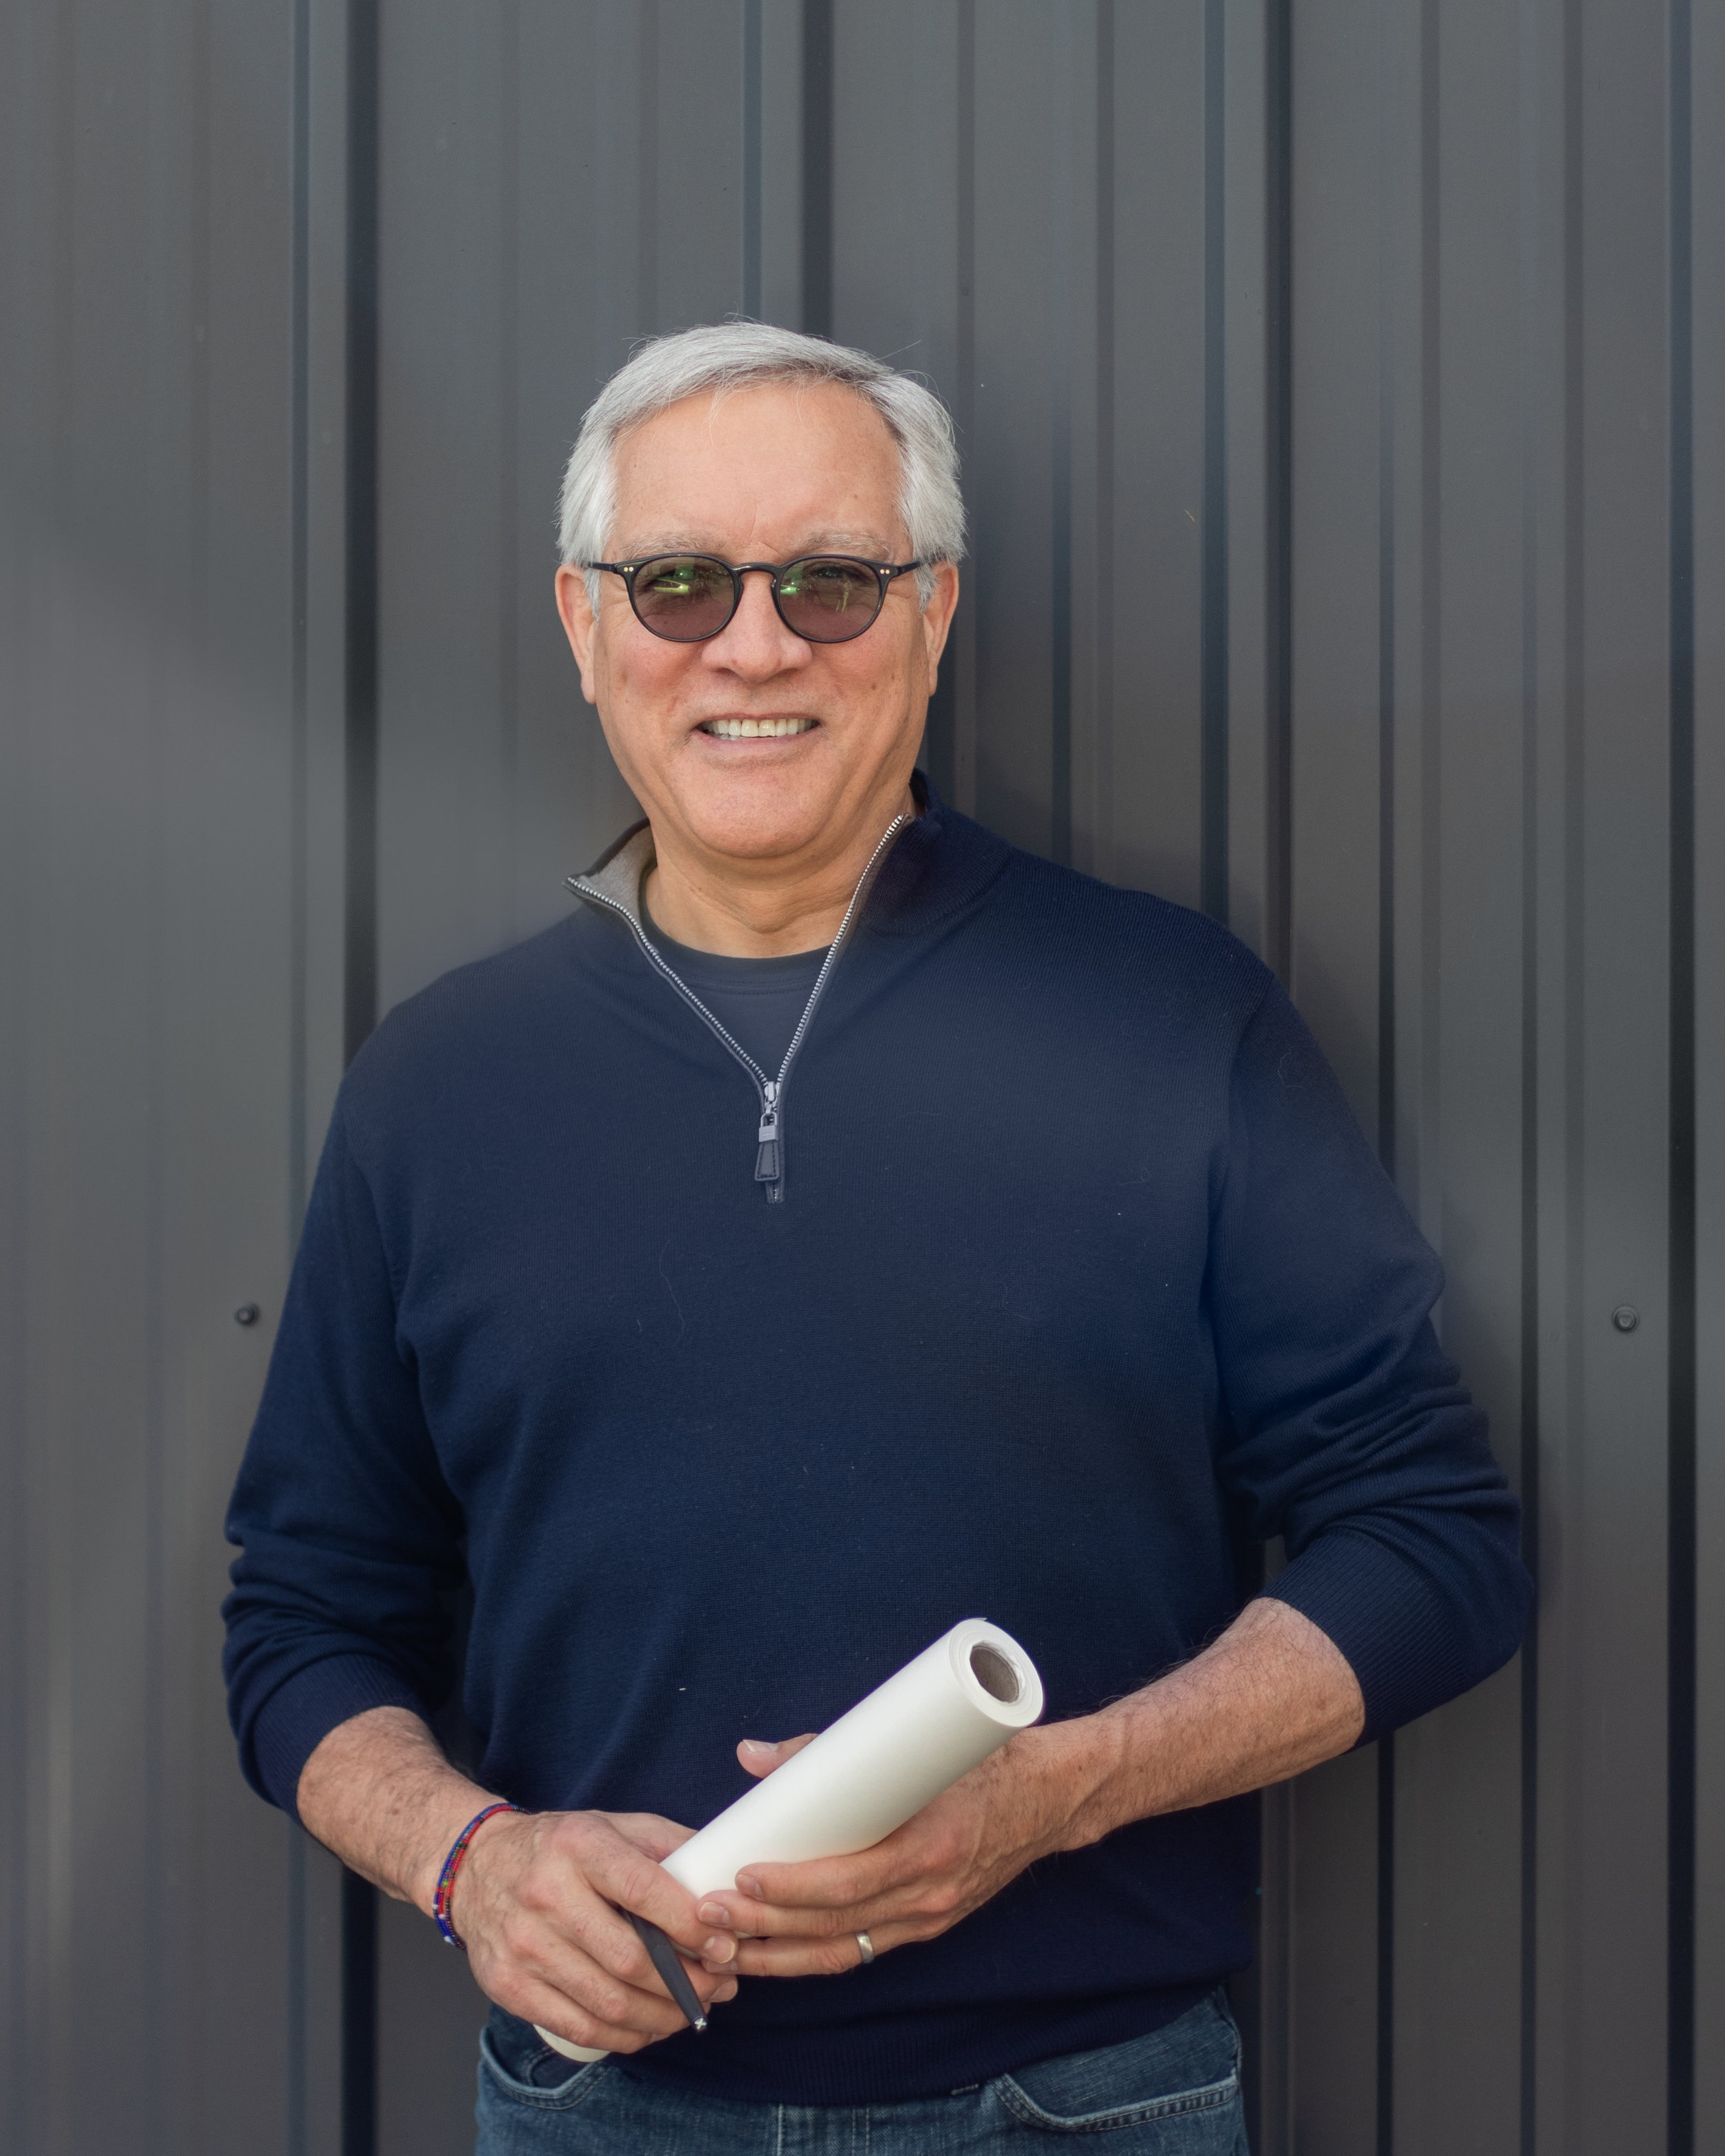 George Wickwire - AIA - Principal Architect